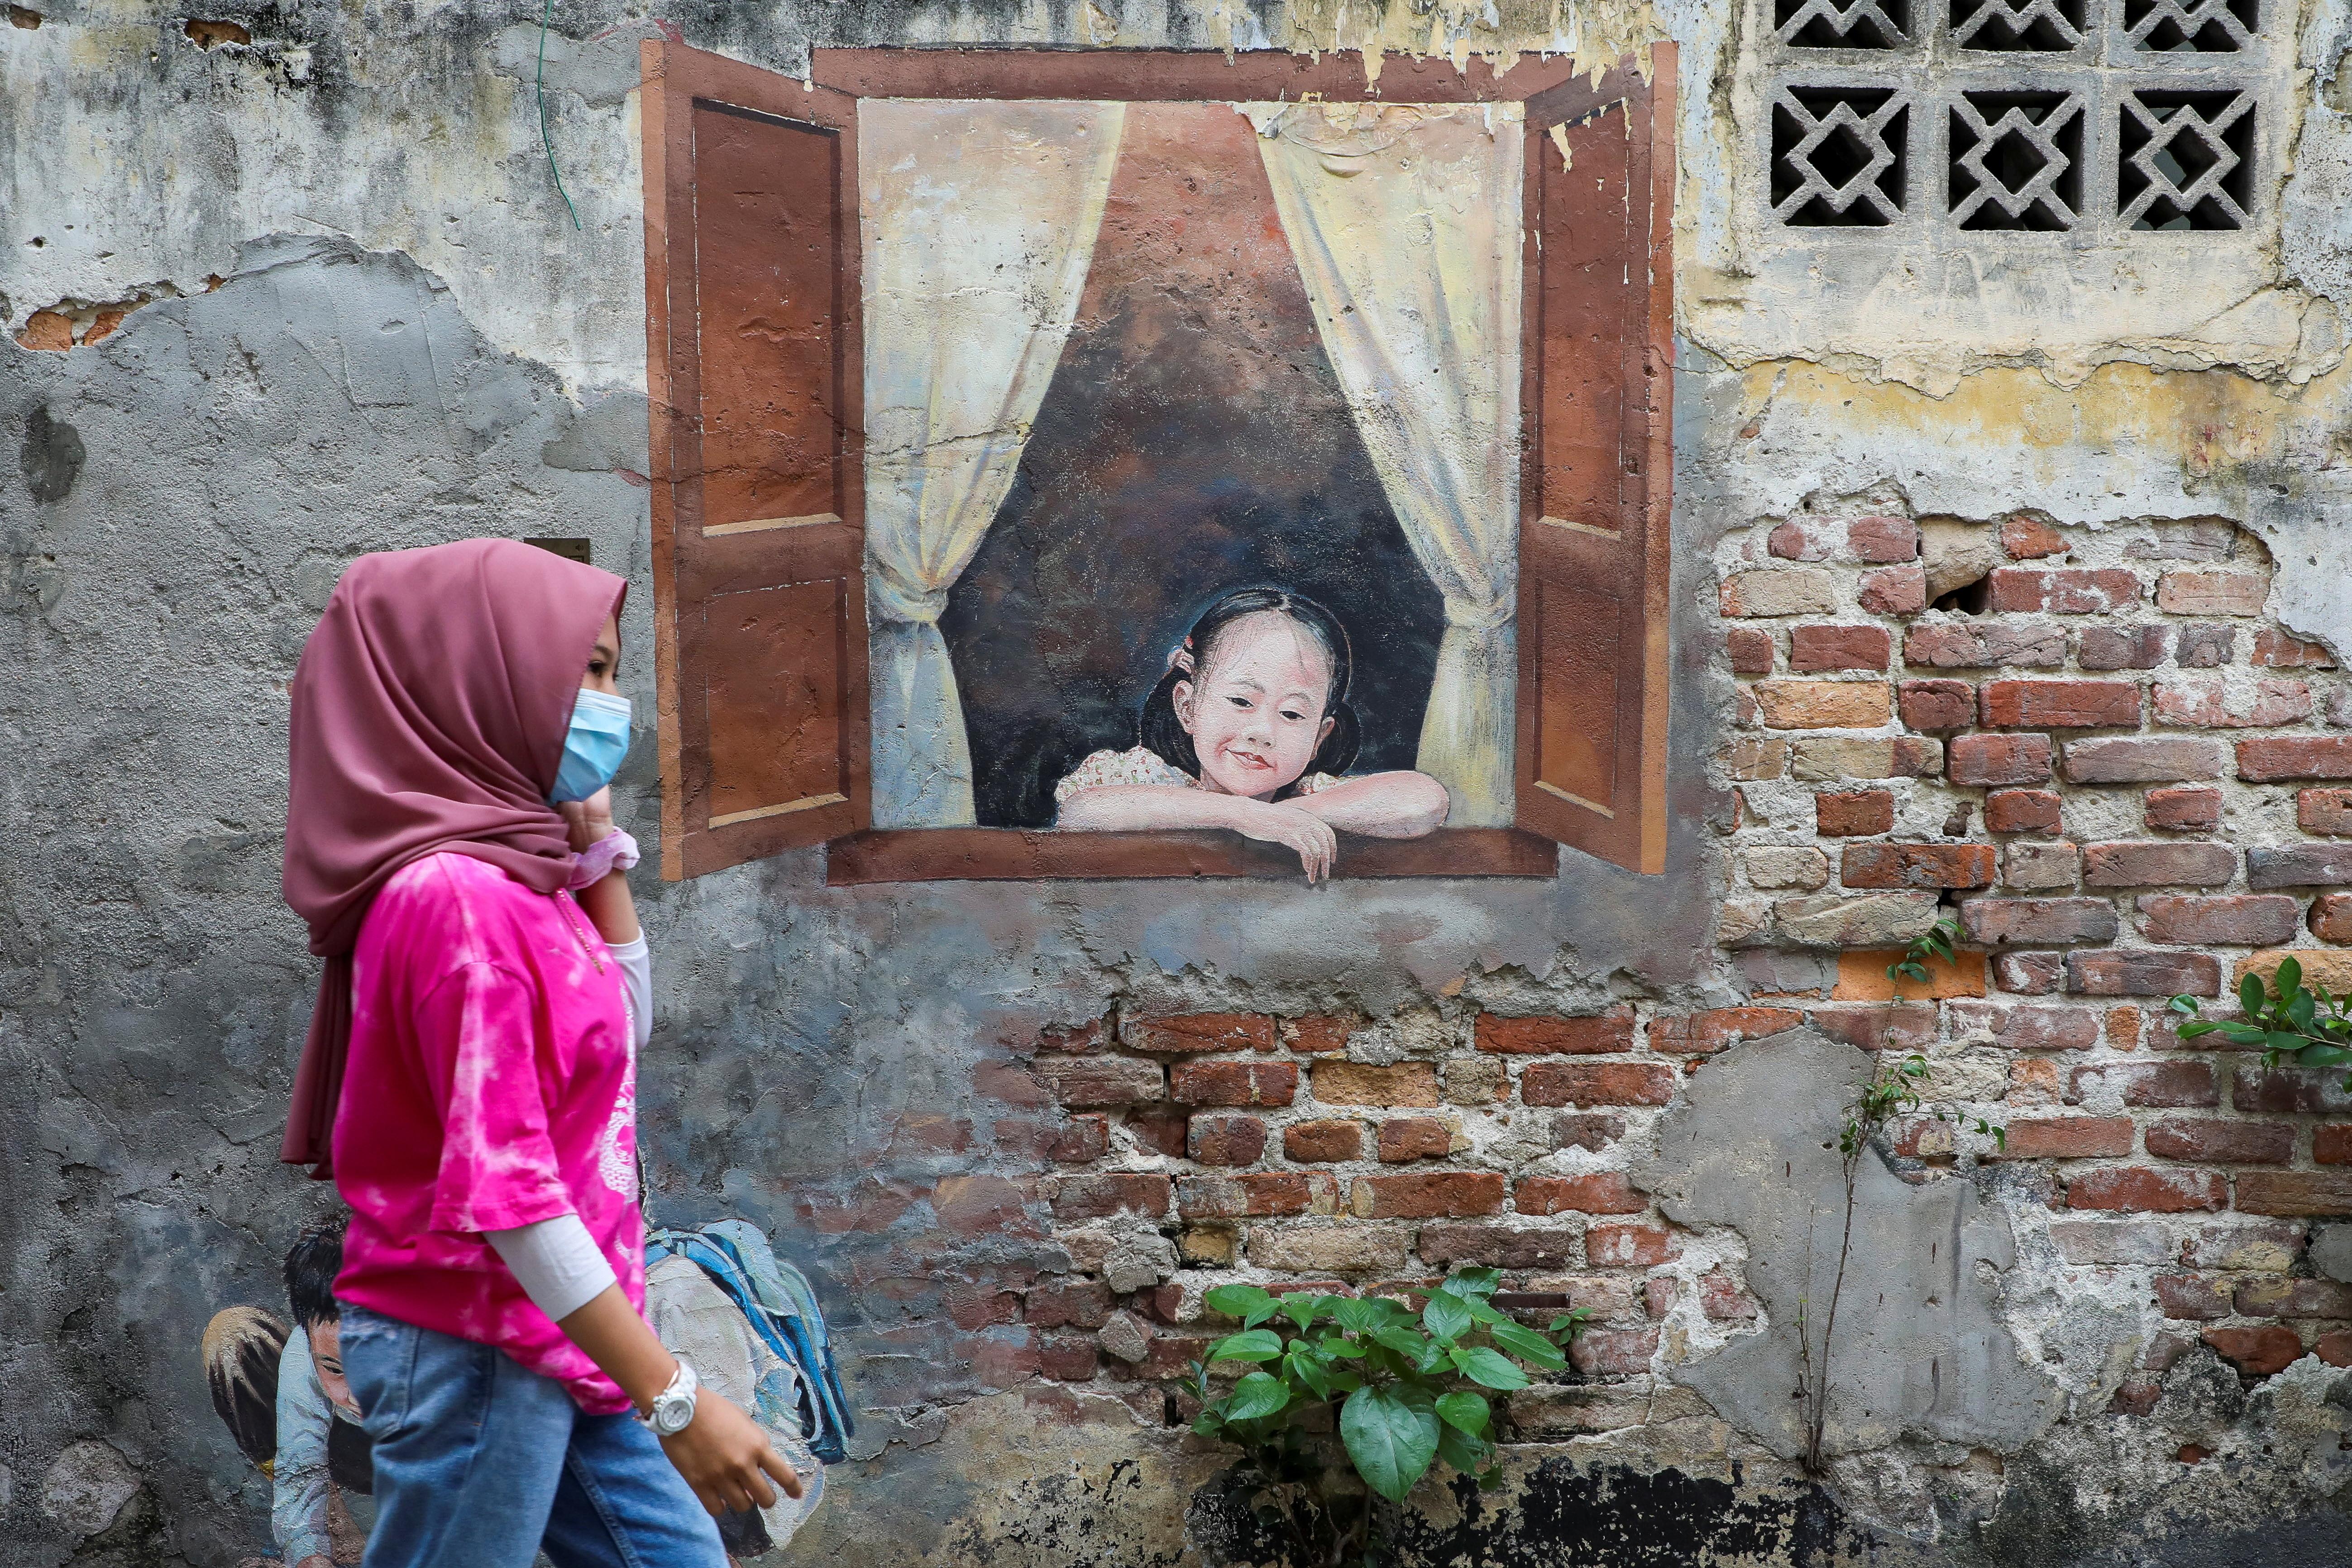 A woman wearing a protective mask walks past a mural, amid the coronavirus disease (COVID-19) outbreak in Kuala Lumpur, Malaysia January 12, 2021. REUTERS/Lim Huey Teng - RC2A6L97PLAR